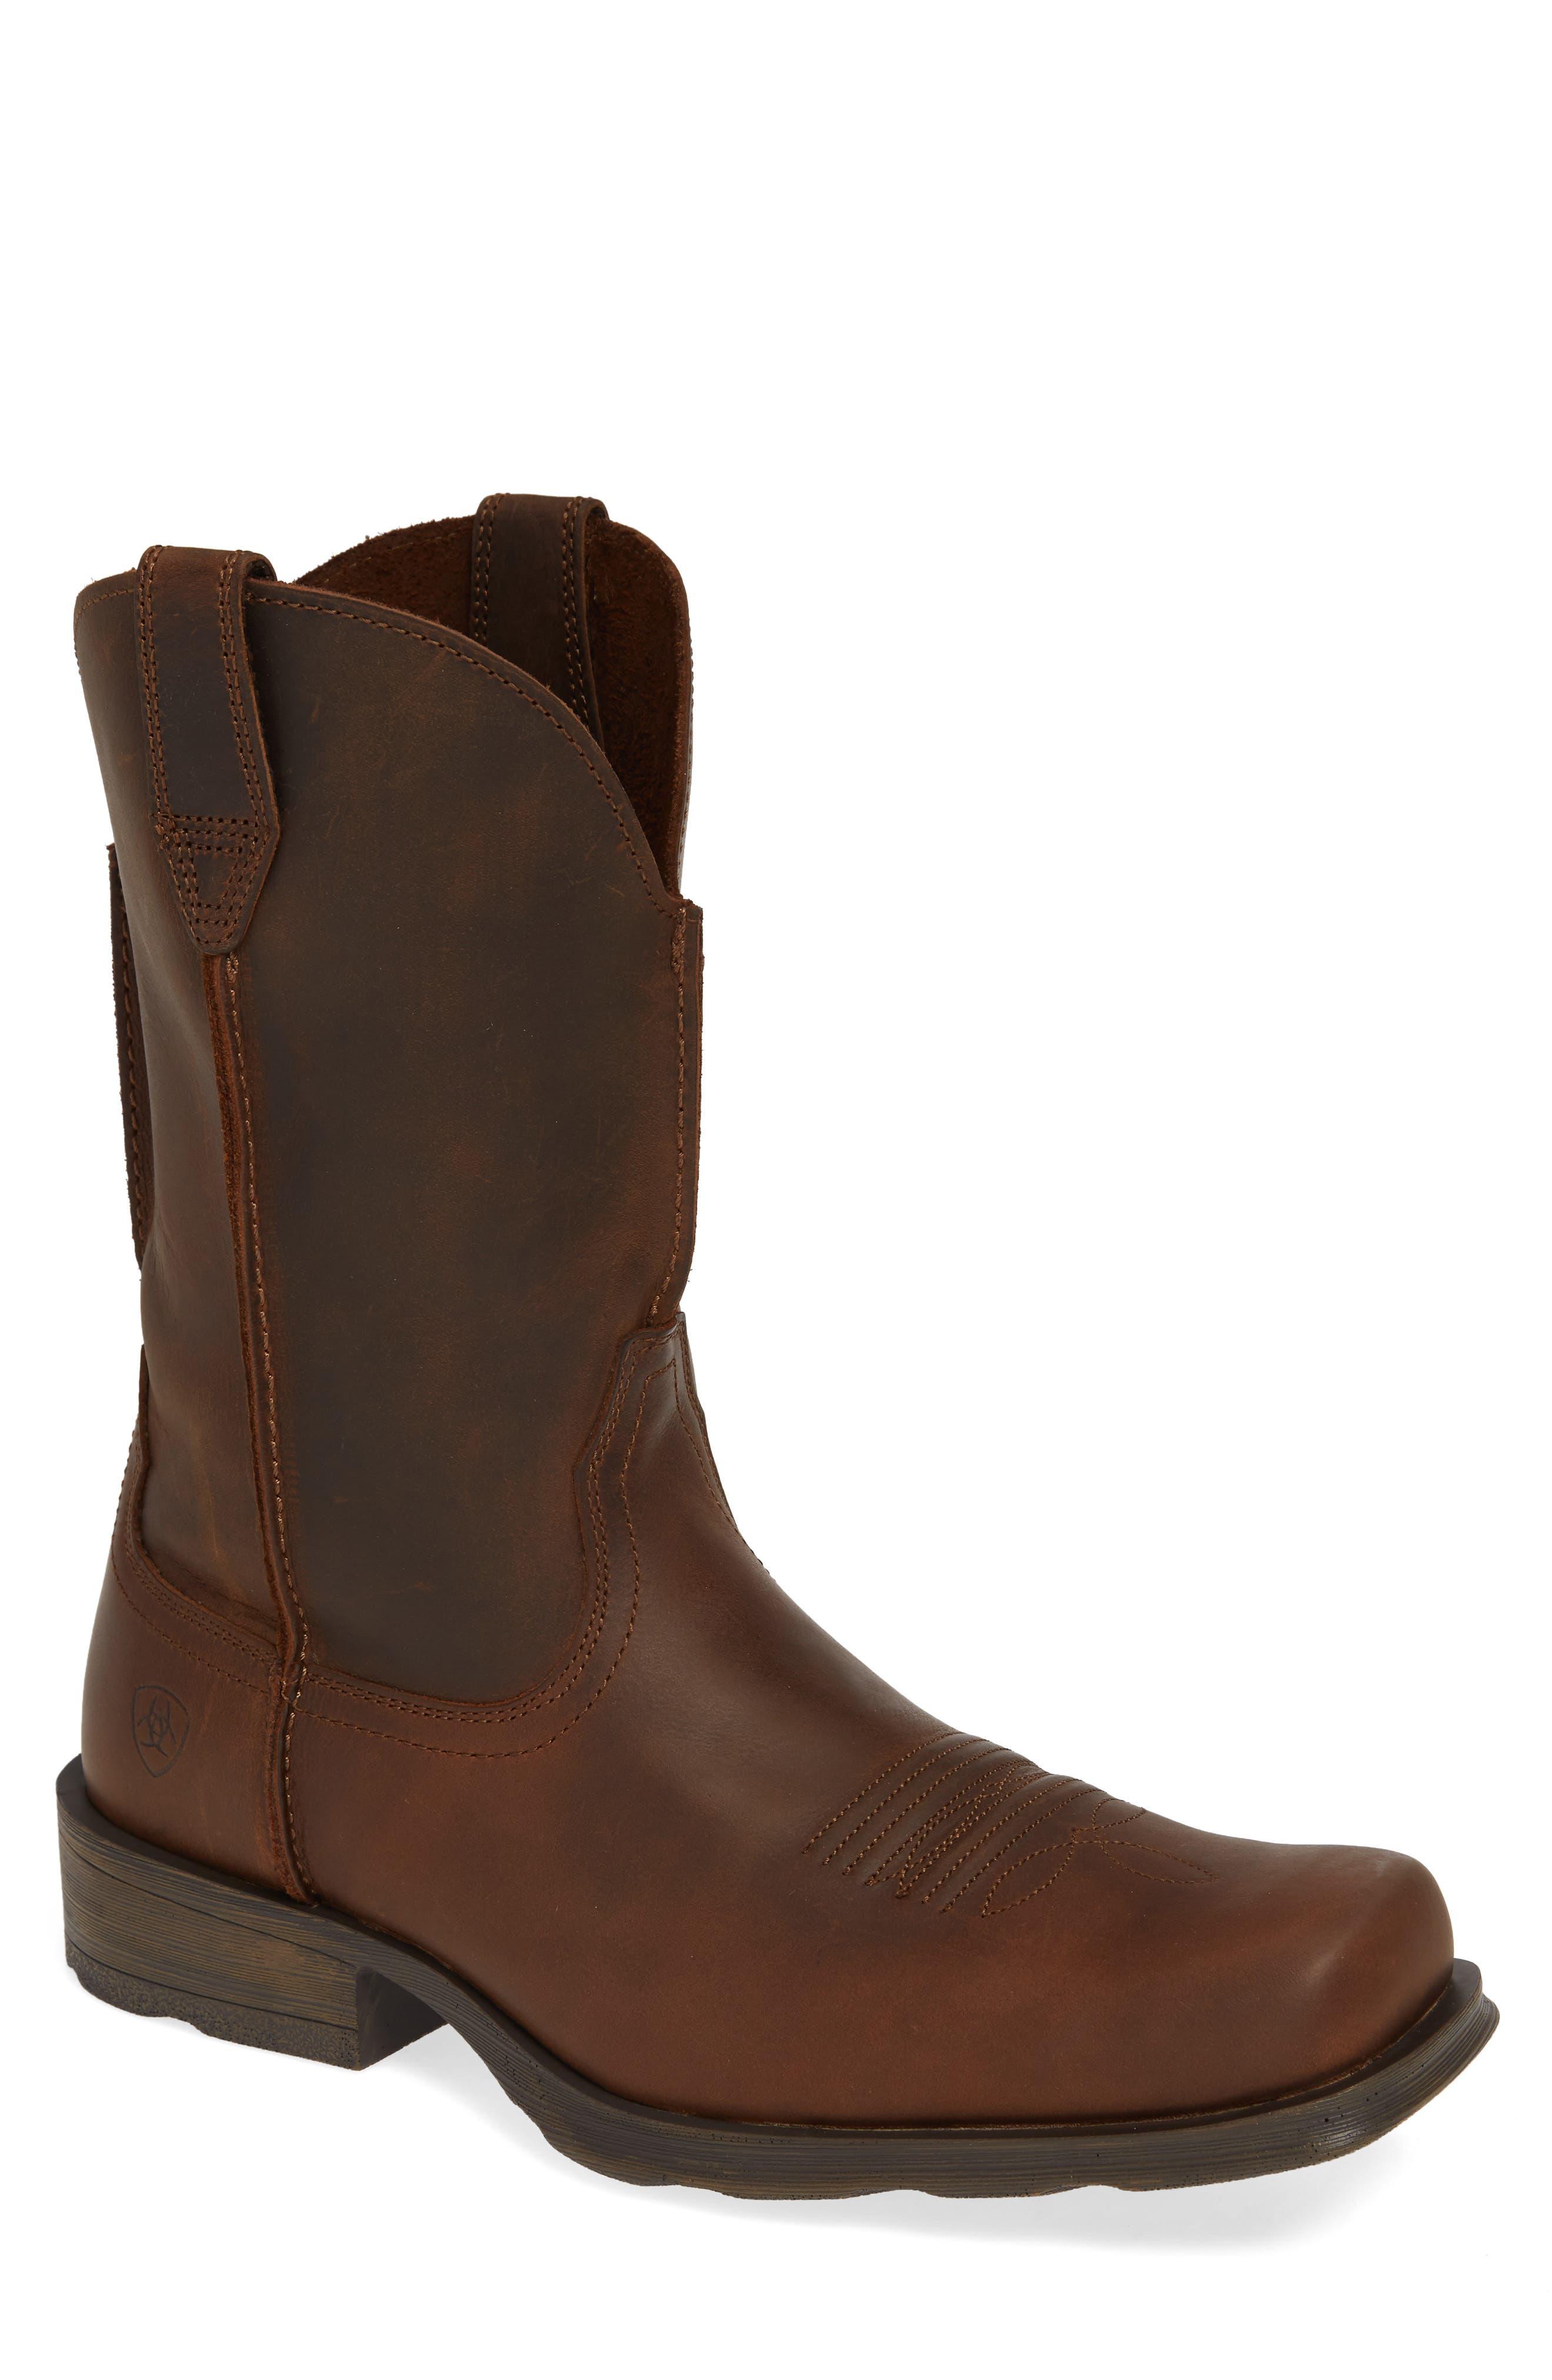 Ariat Rambler Ultra Boot- Brown